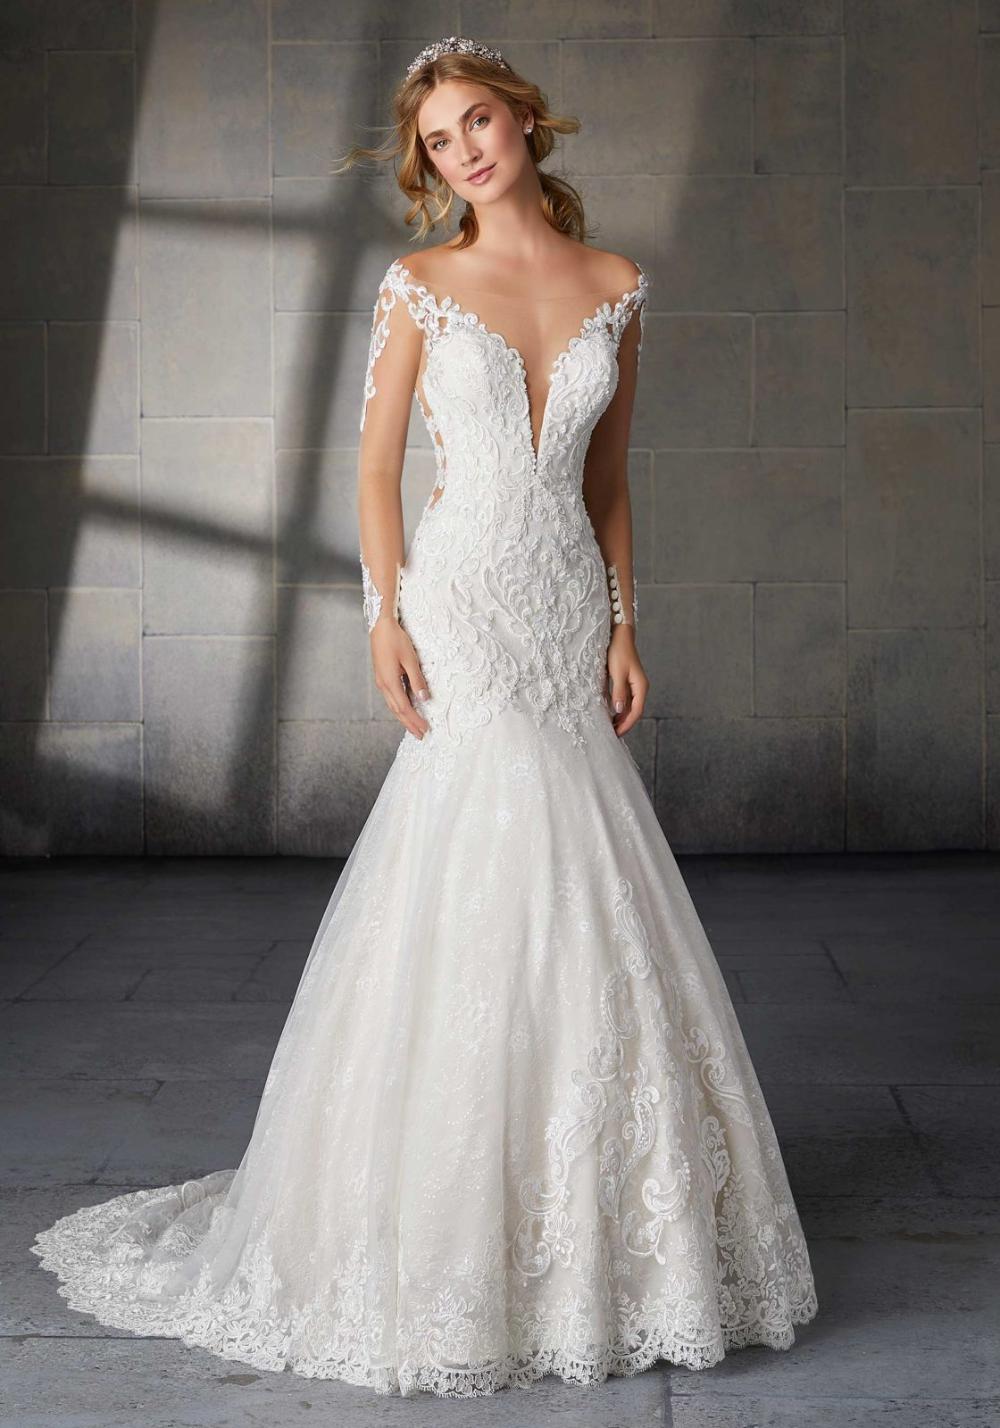 Sharon Wedding Dress Morilee In 2020 Long Sleeve Wedding